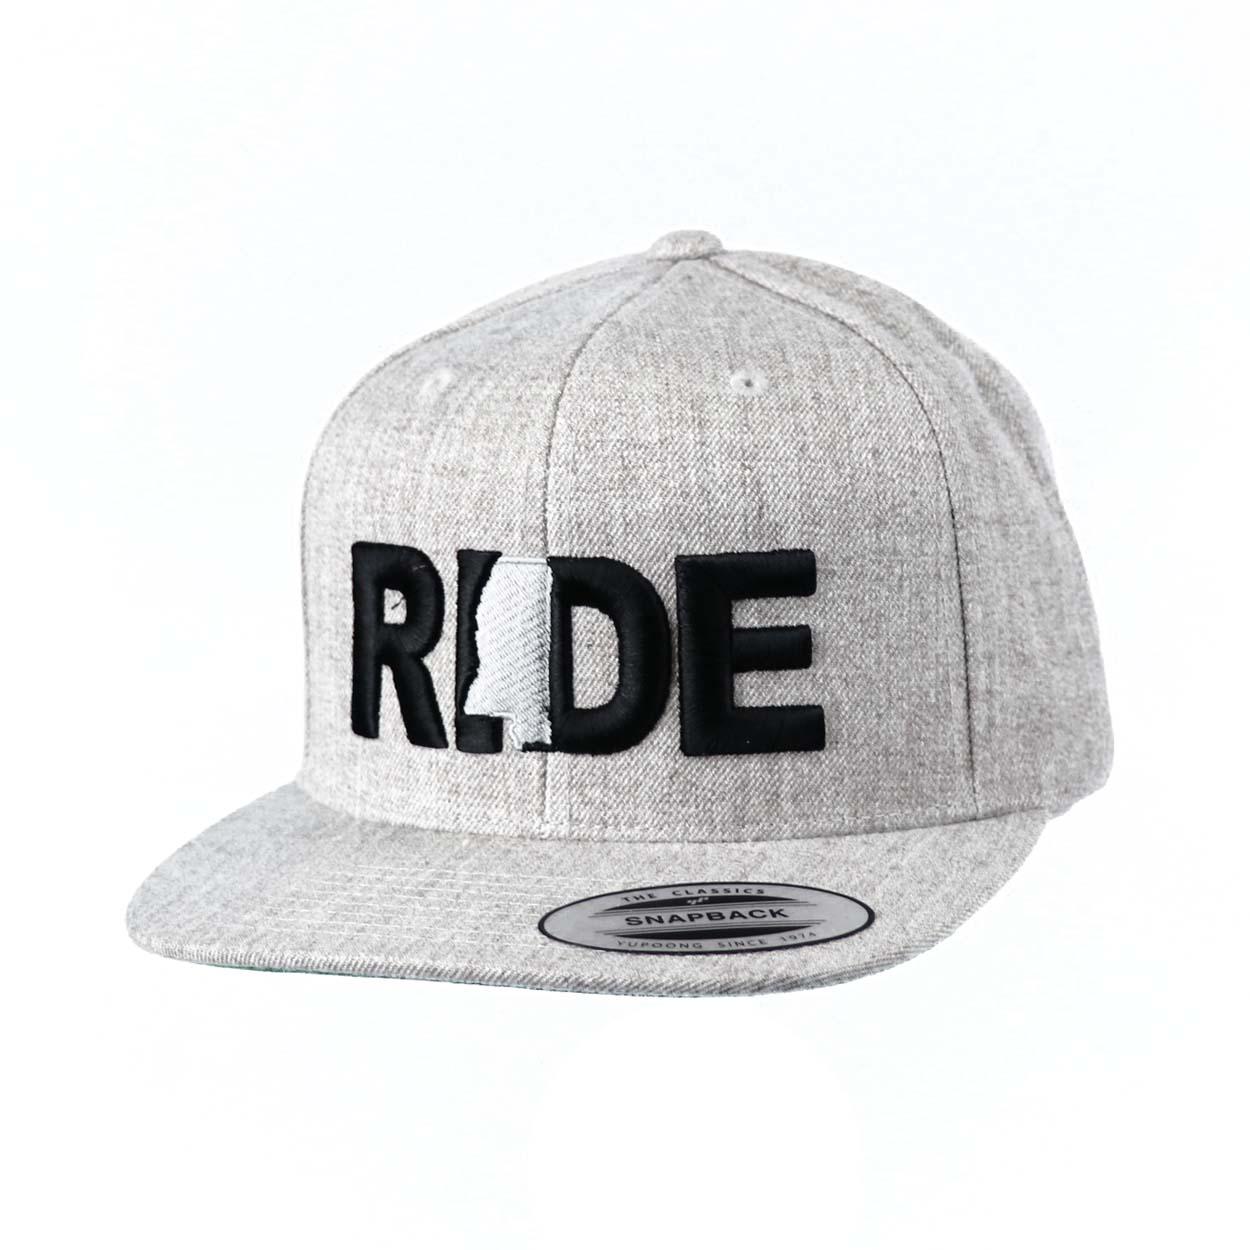 Ride Mississippi Classic Embroidered  Snapback Flat Brim Hat Gray/Black